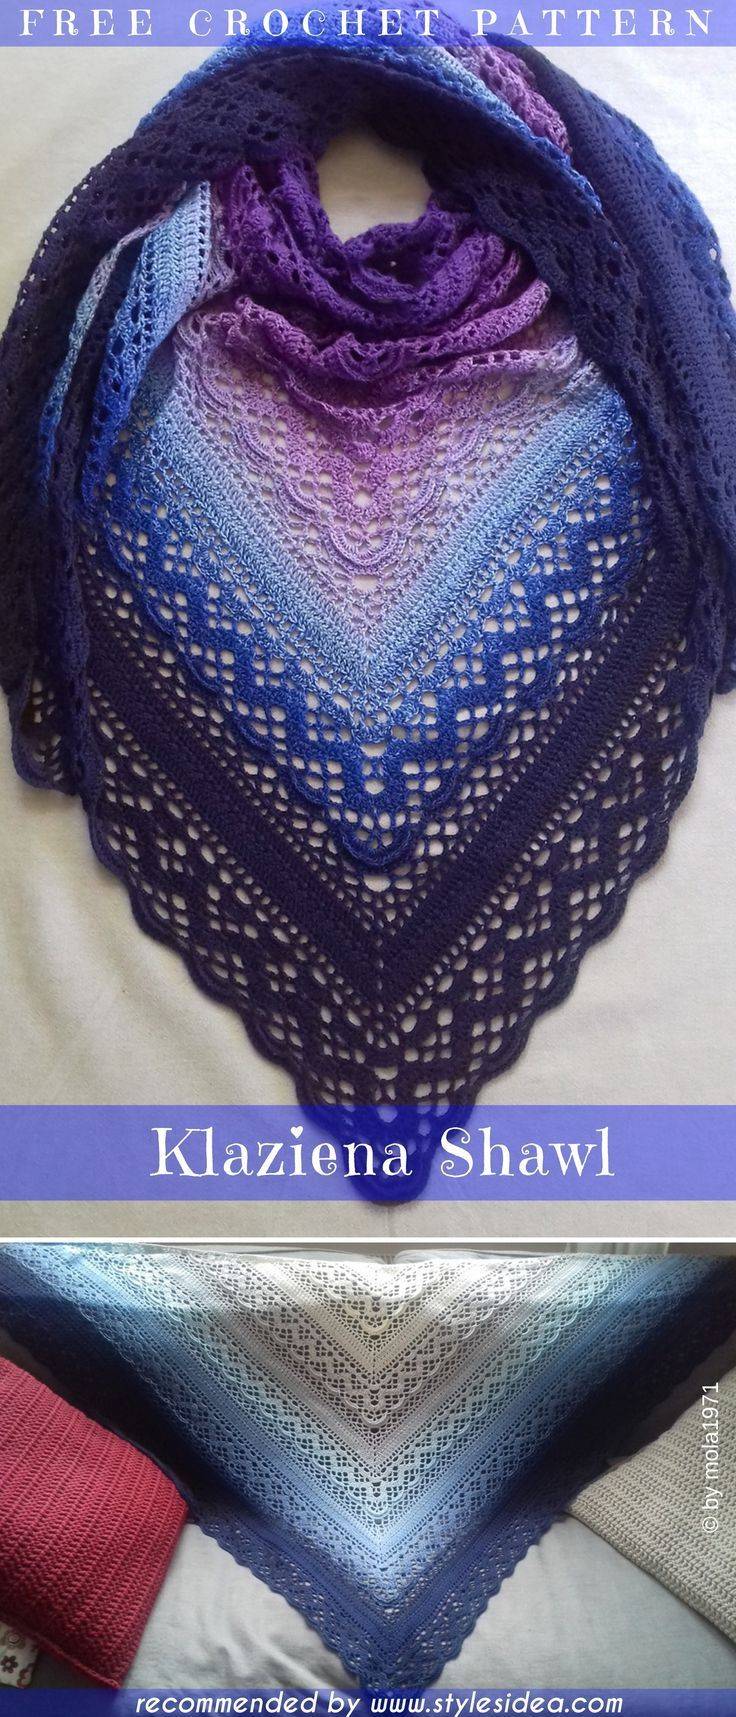 Klaziena Crochet Shawl Free Pattern Crochet → Shawl #shawlcrochetpattern